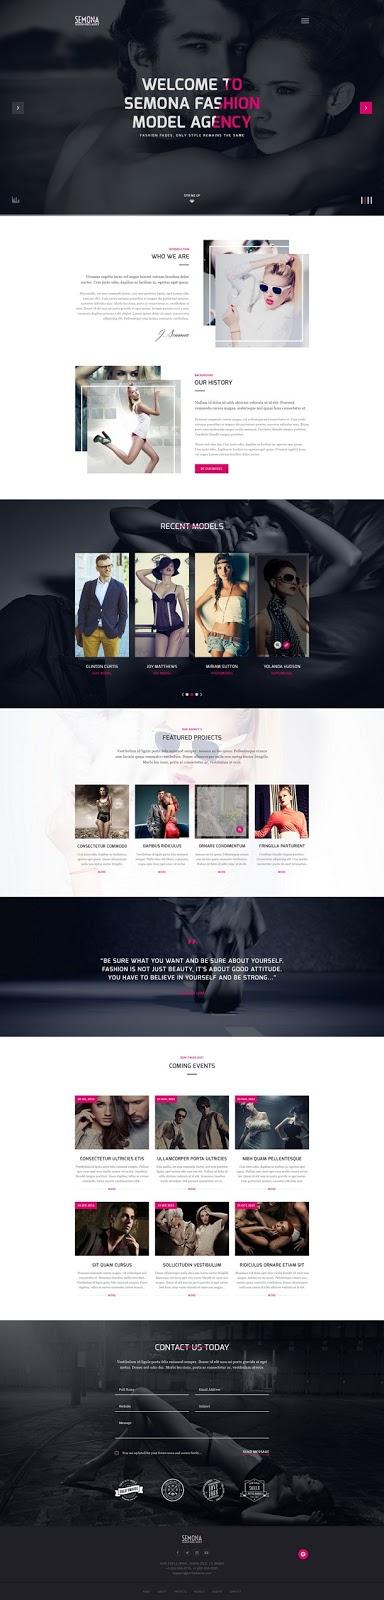 Fashion Semona Creative Joomla Template